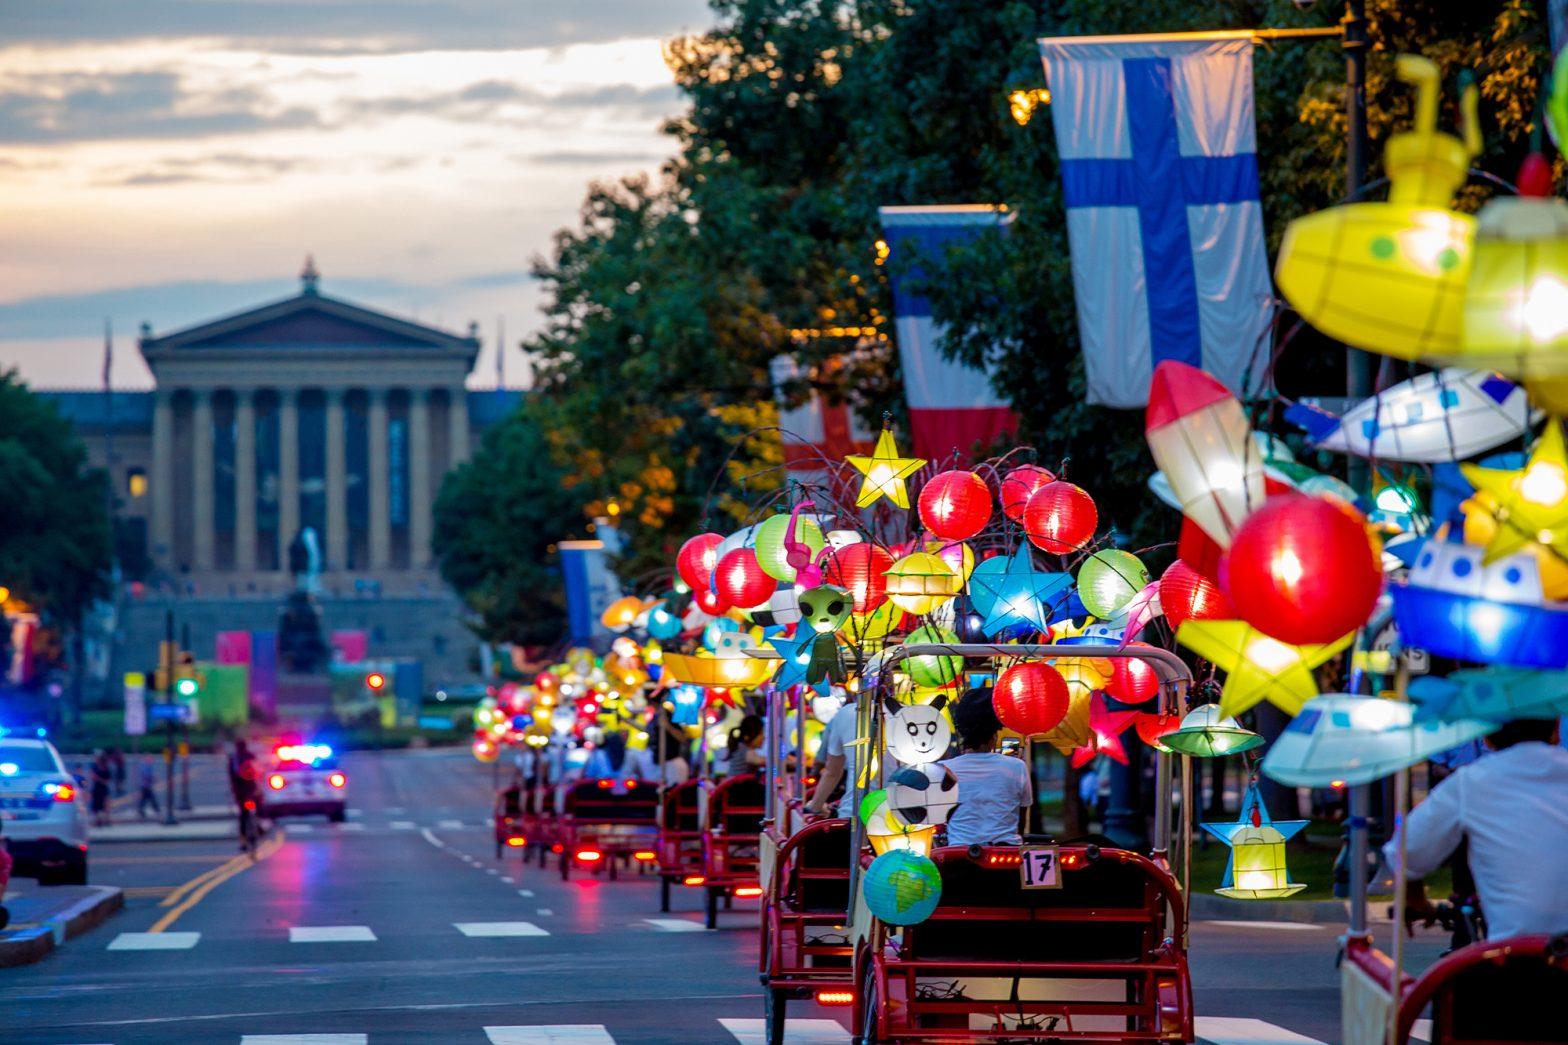 Coaster Pedicabs Featured in Philadelphia Art Expo